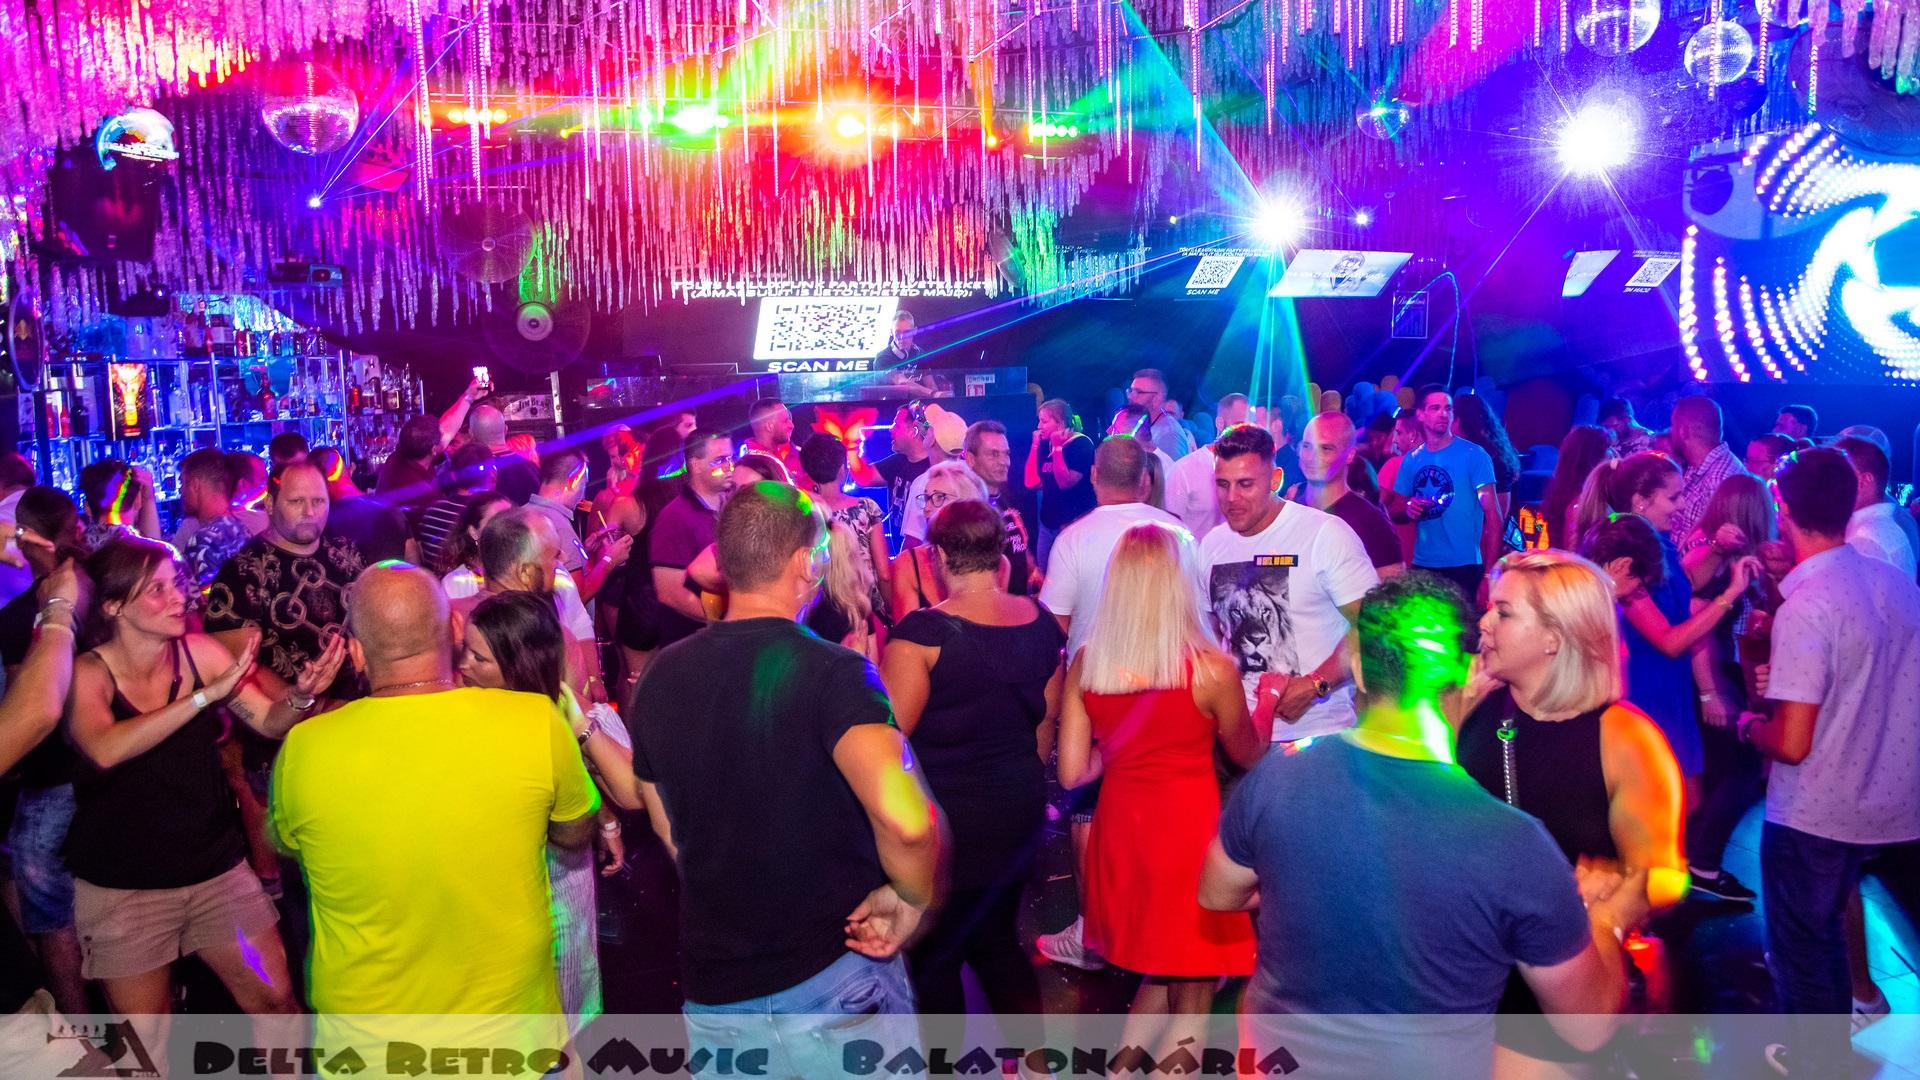 luxfunk-radio-funky-party_200807_delta retro-music-factory_058